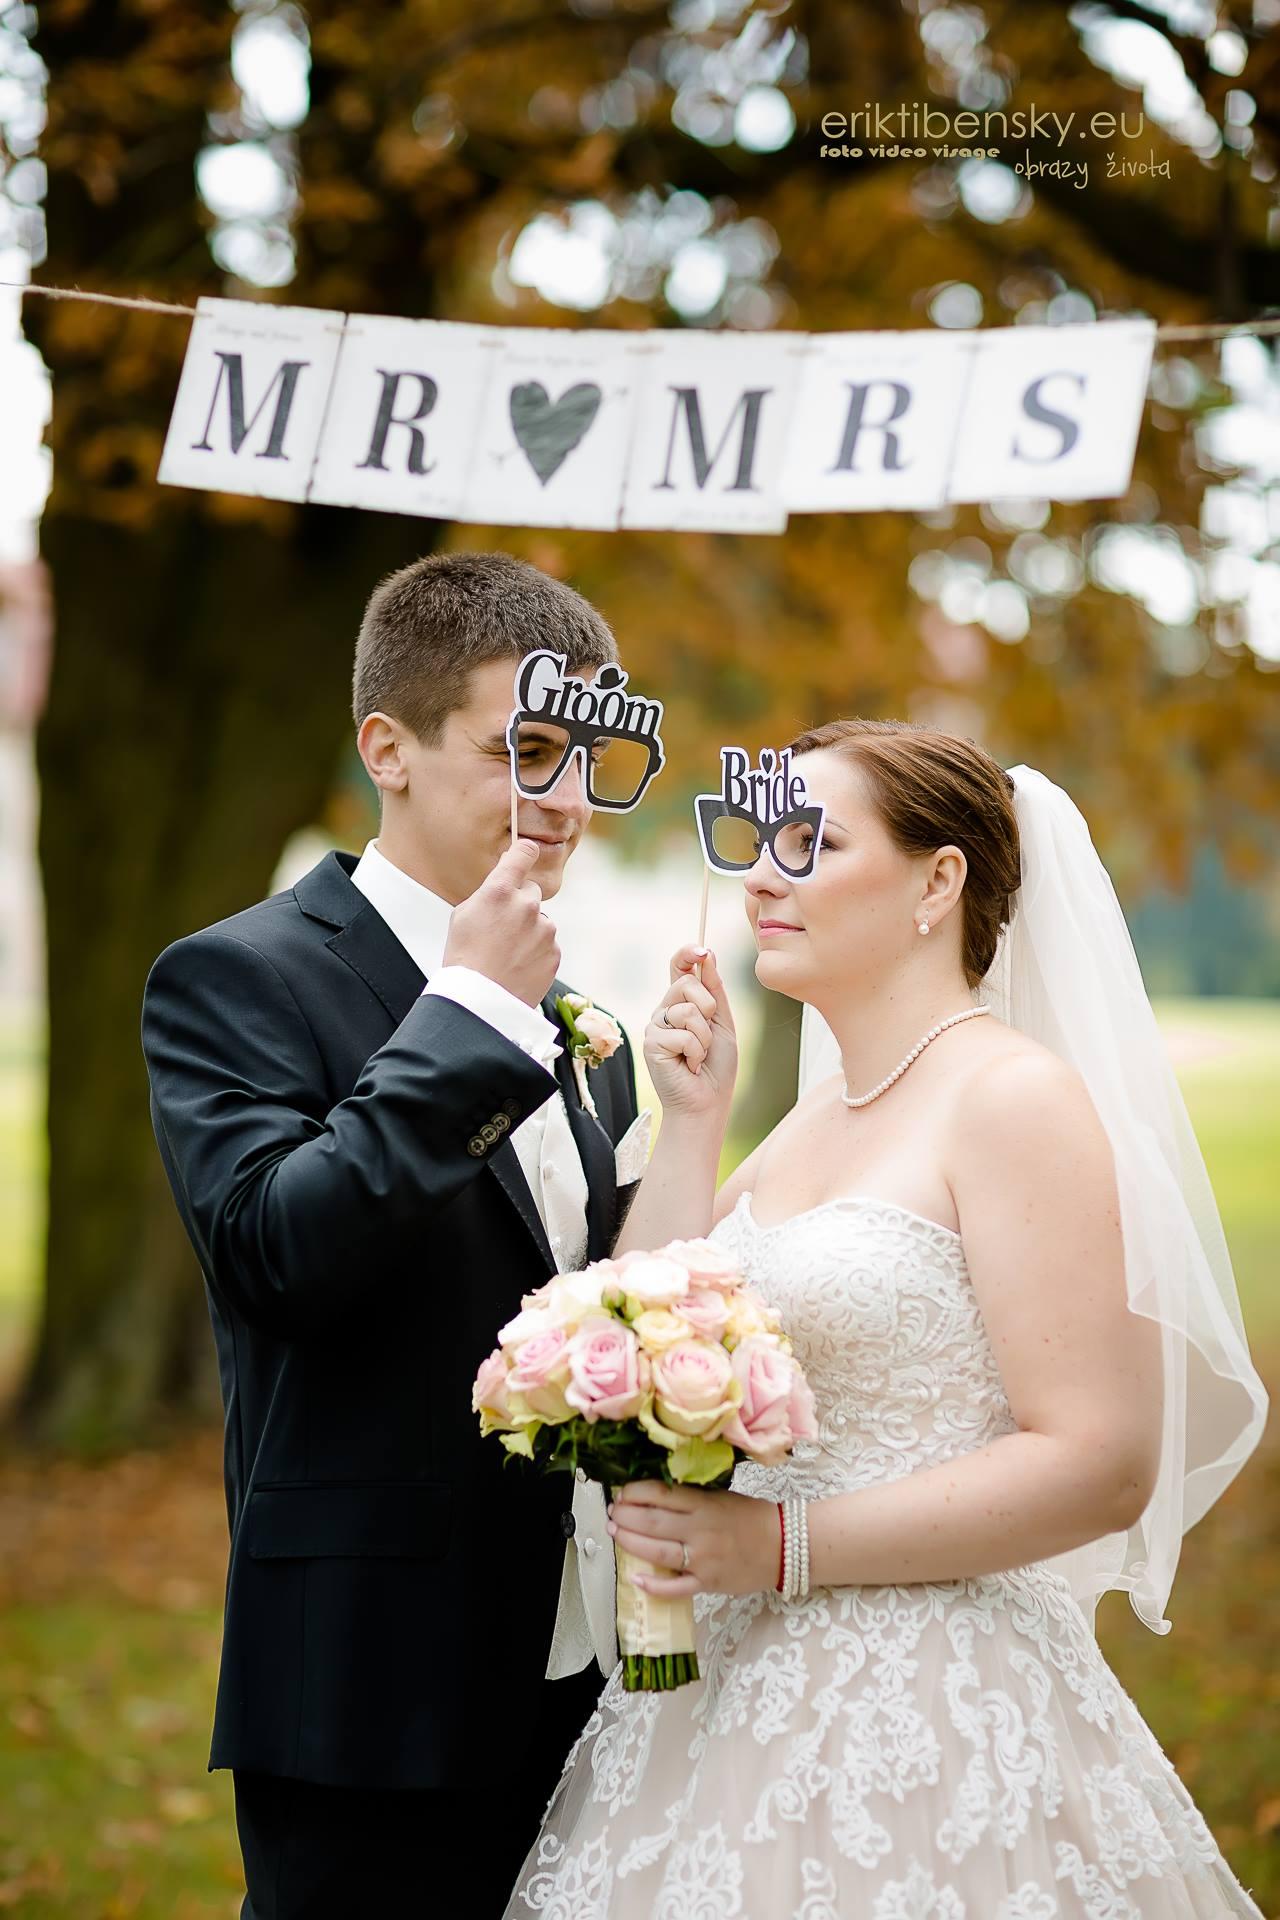 eriktibensky-eu-svadobny-fotograf-wedding-photographer-3089